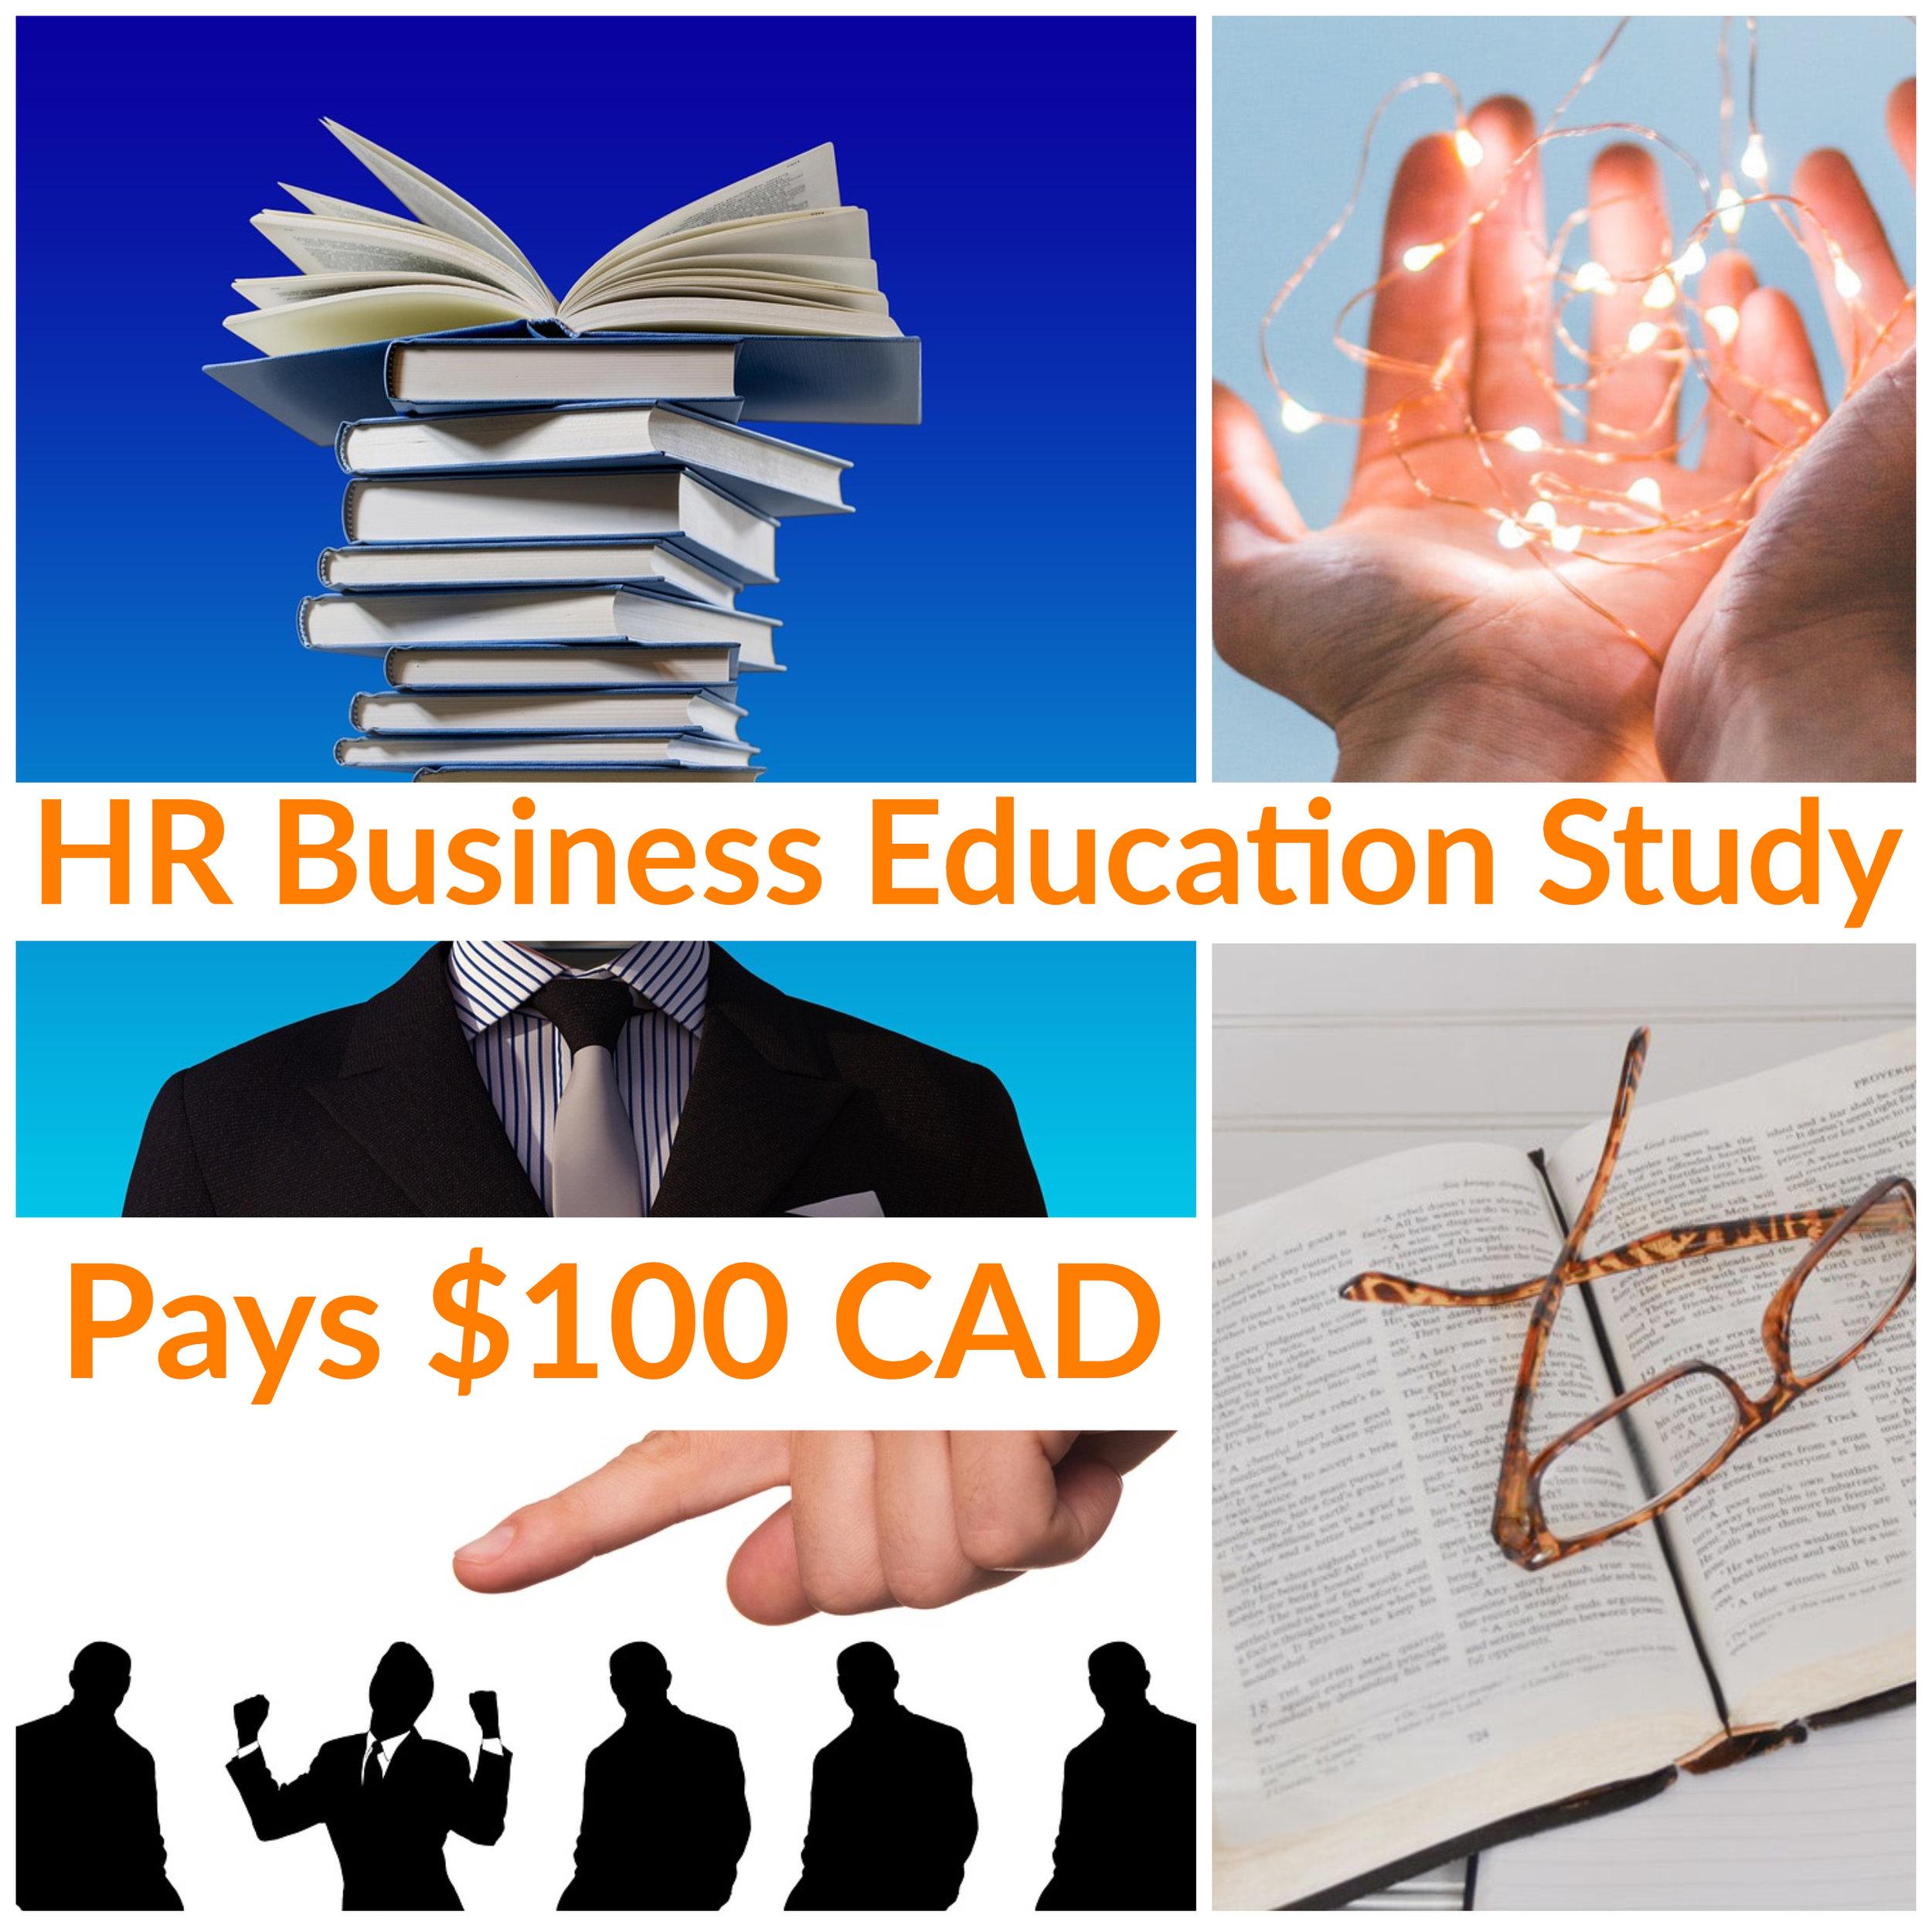 Gold & Gold - HR Business Education Study.jpg